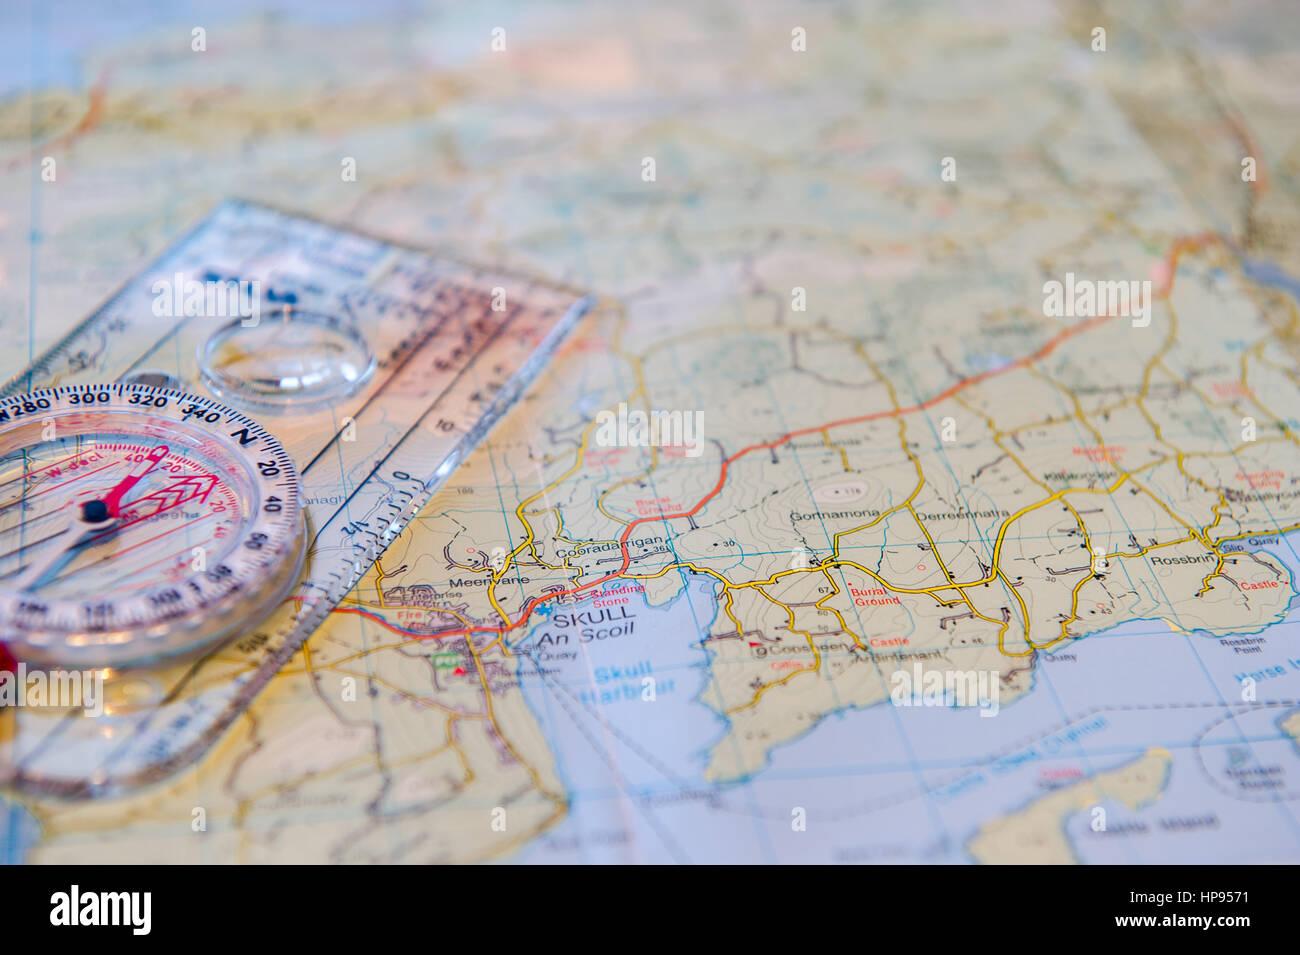 Silva compass lies on a map of Ireland. - Stock Image